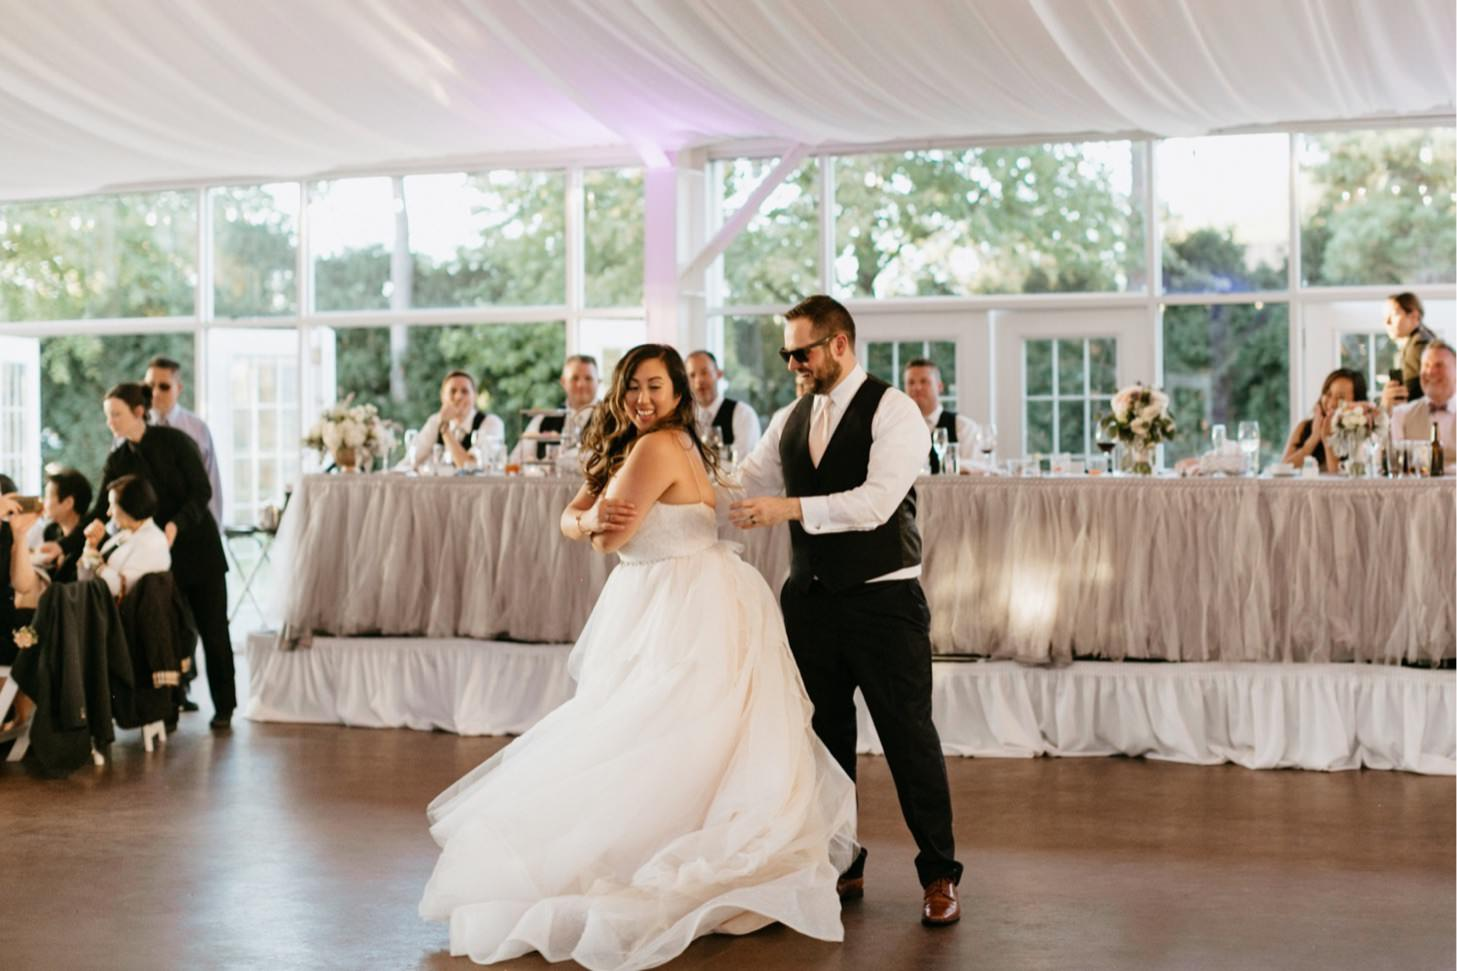 ritz-charles-wedding-reception-downtown-indianapolis-wedding-photographer050.JPG